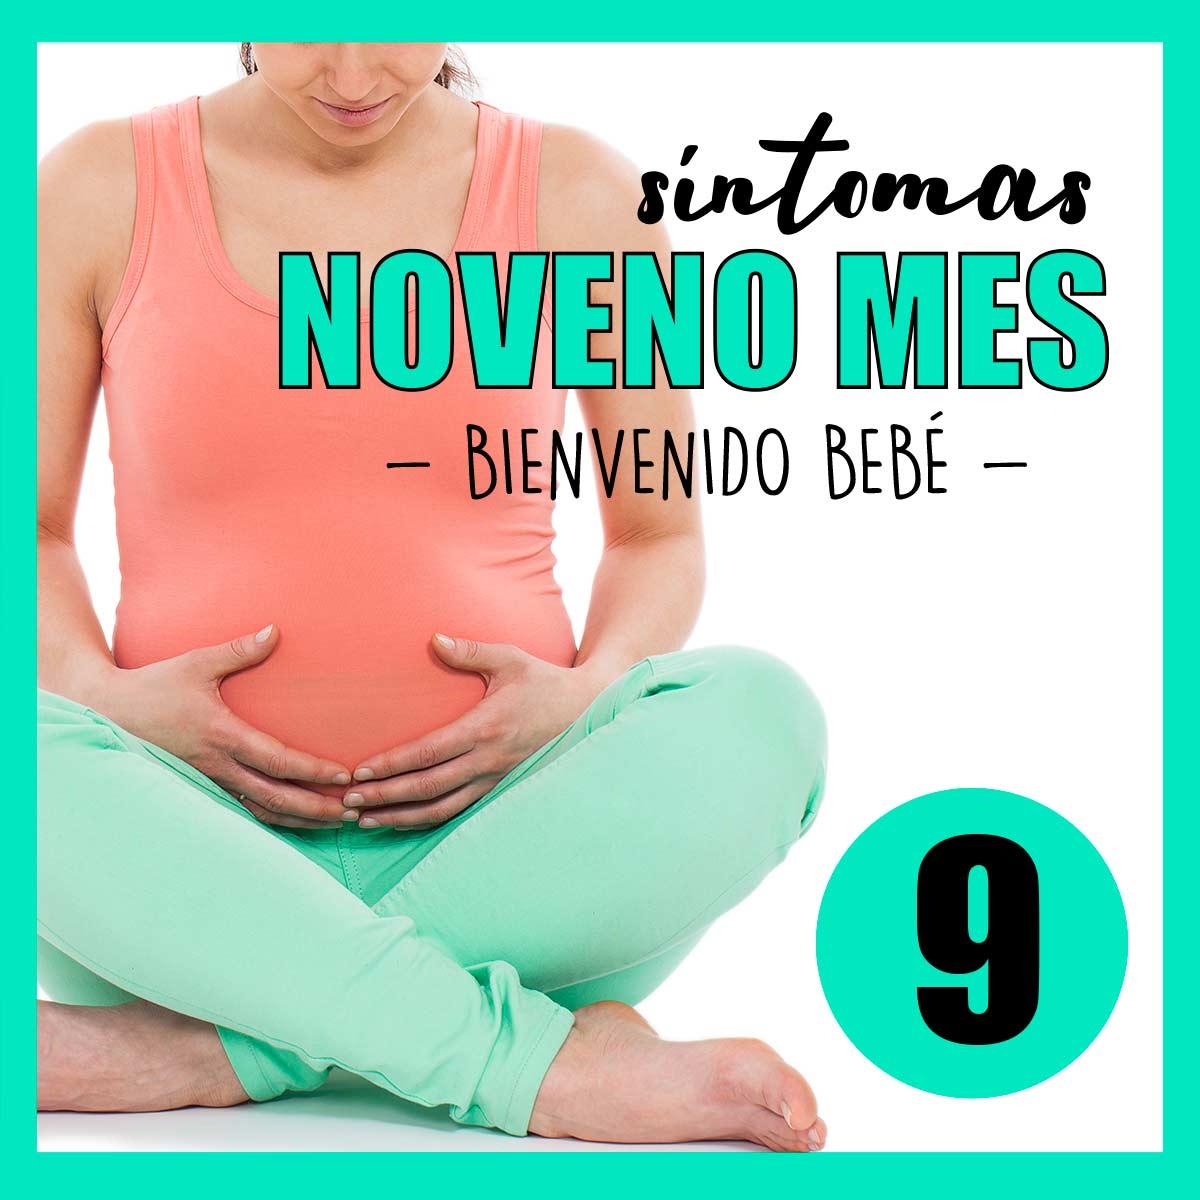 sintomas-noveno-mes-embarazo-9-mes-40-semanas-embarazada-tercer-trimestre